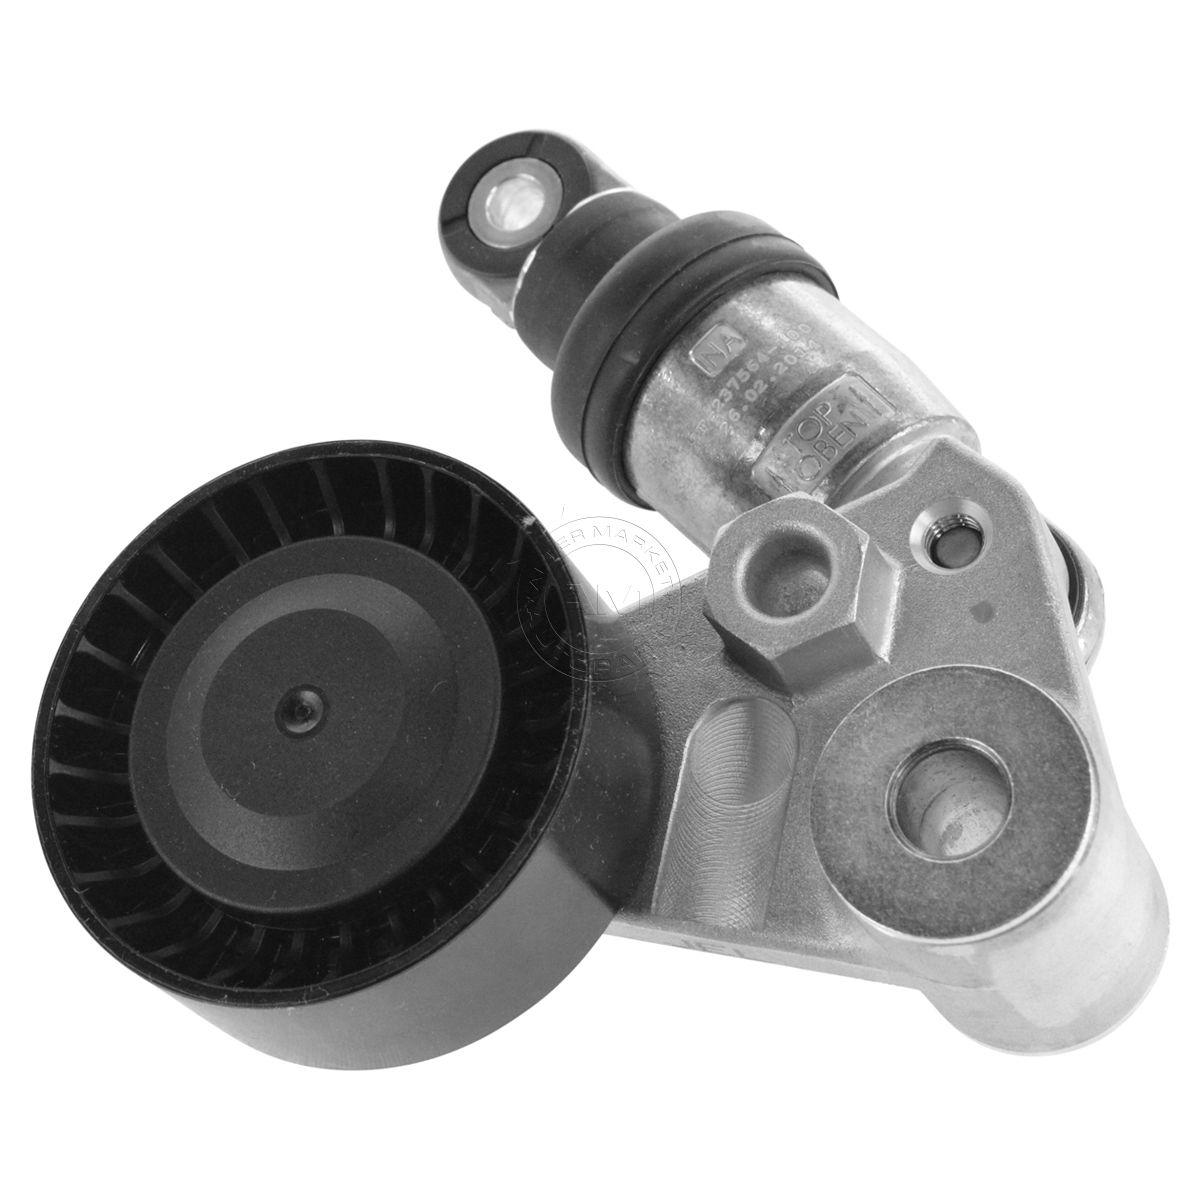 serpentine belt tensioner with pulley for hyundai kia v6 3 3l 3 5l rh ebay com Belt Tensioner Tool Dayco Belts Engine